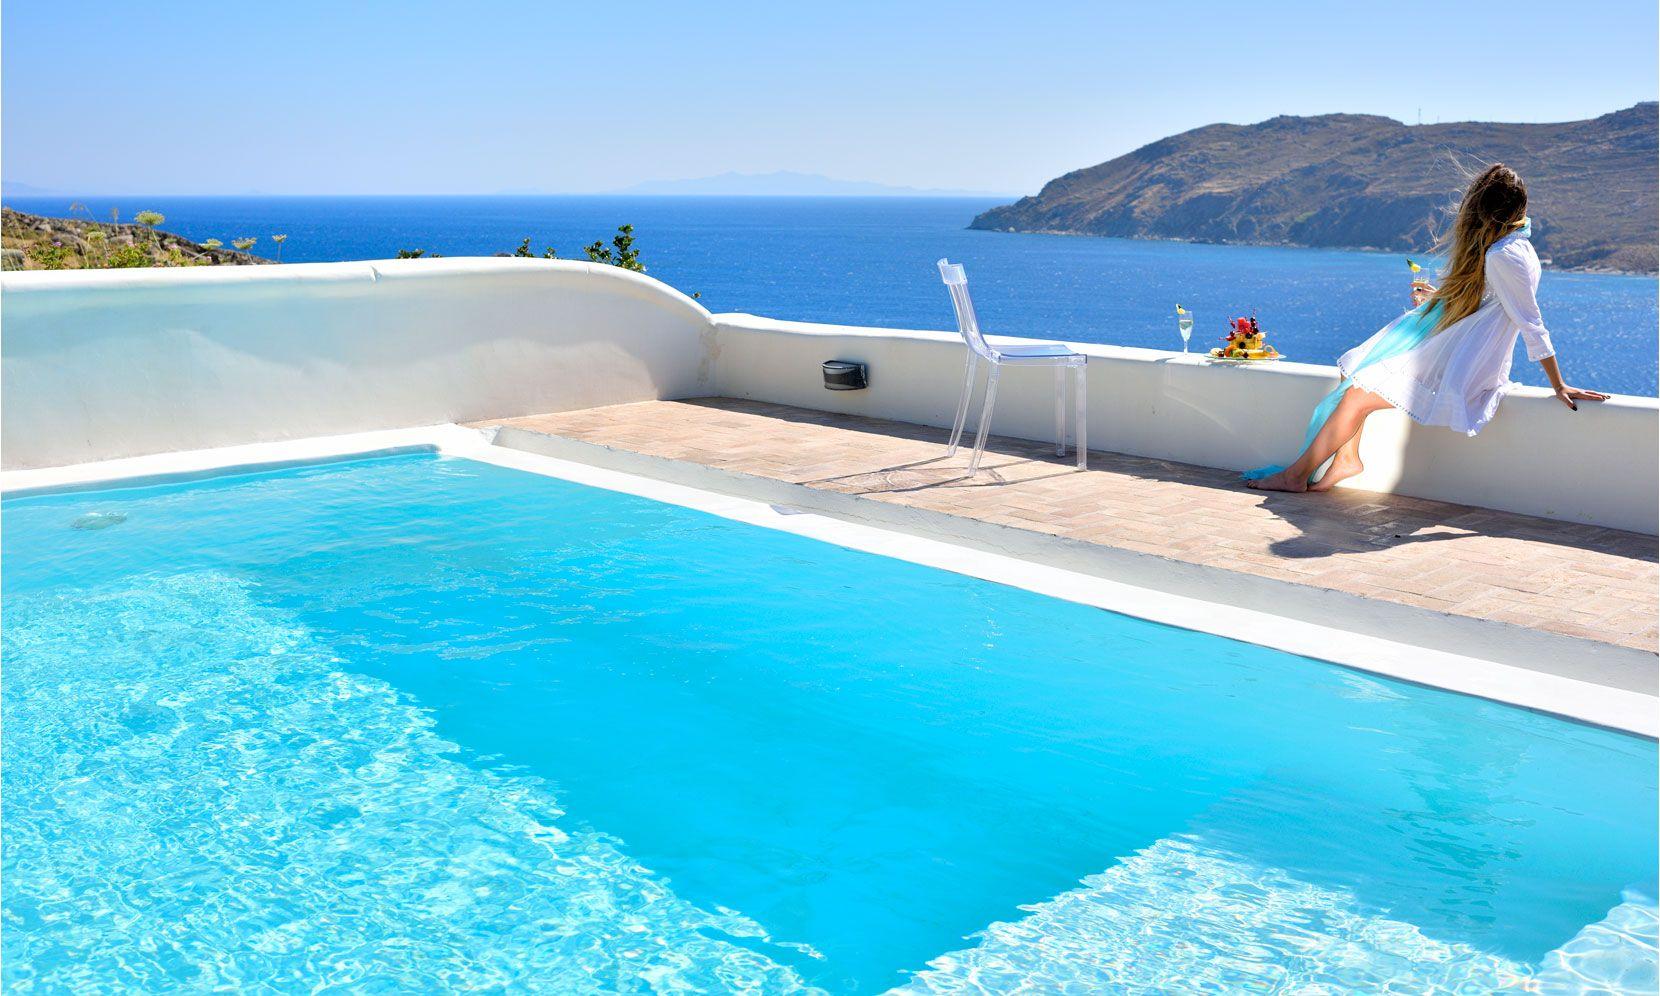 Mykonos Villa Celine jumbotron image